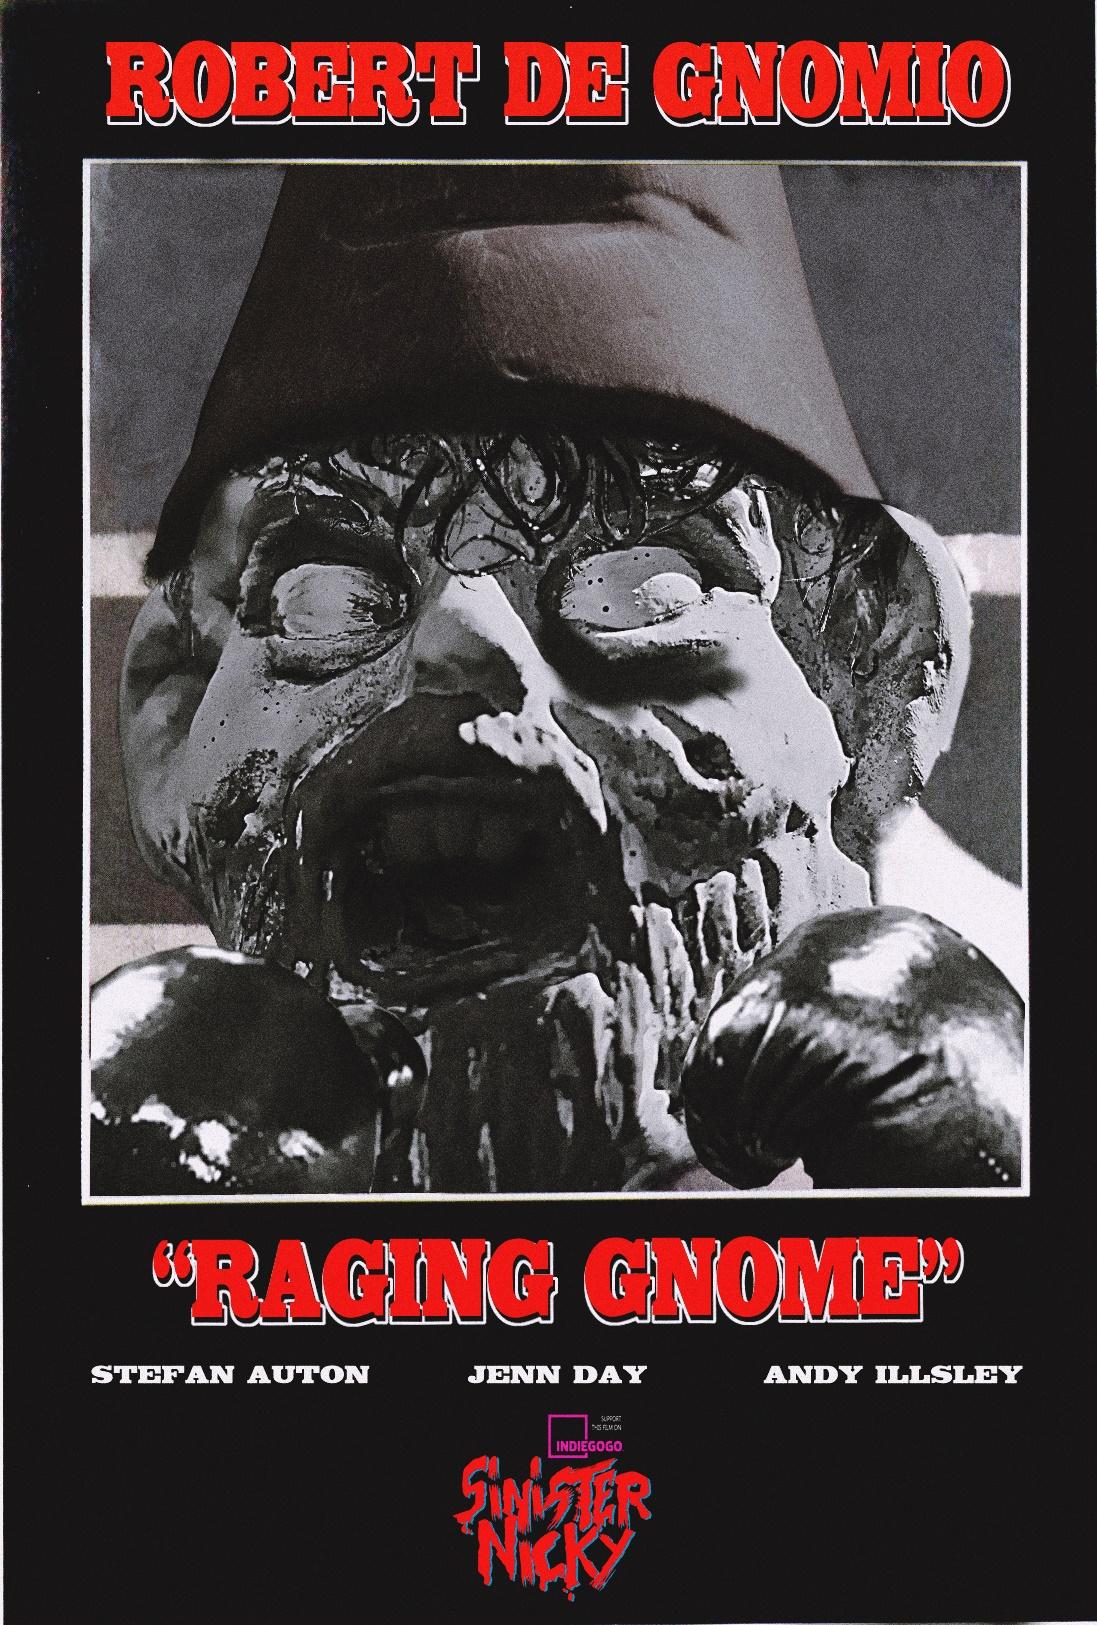 RAGING GNOME